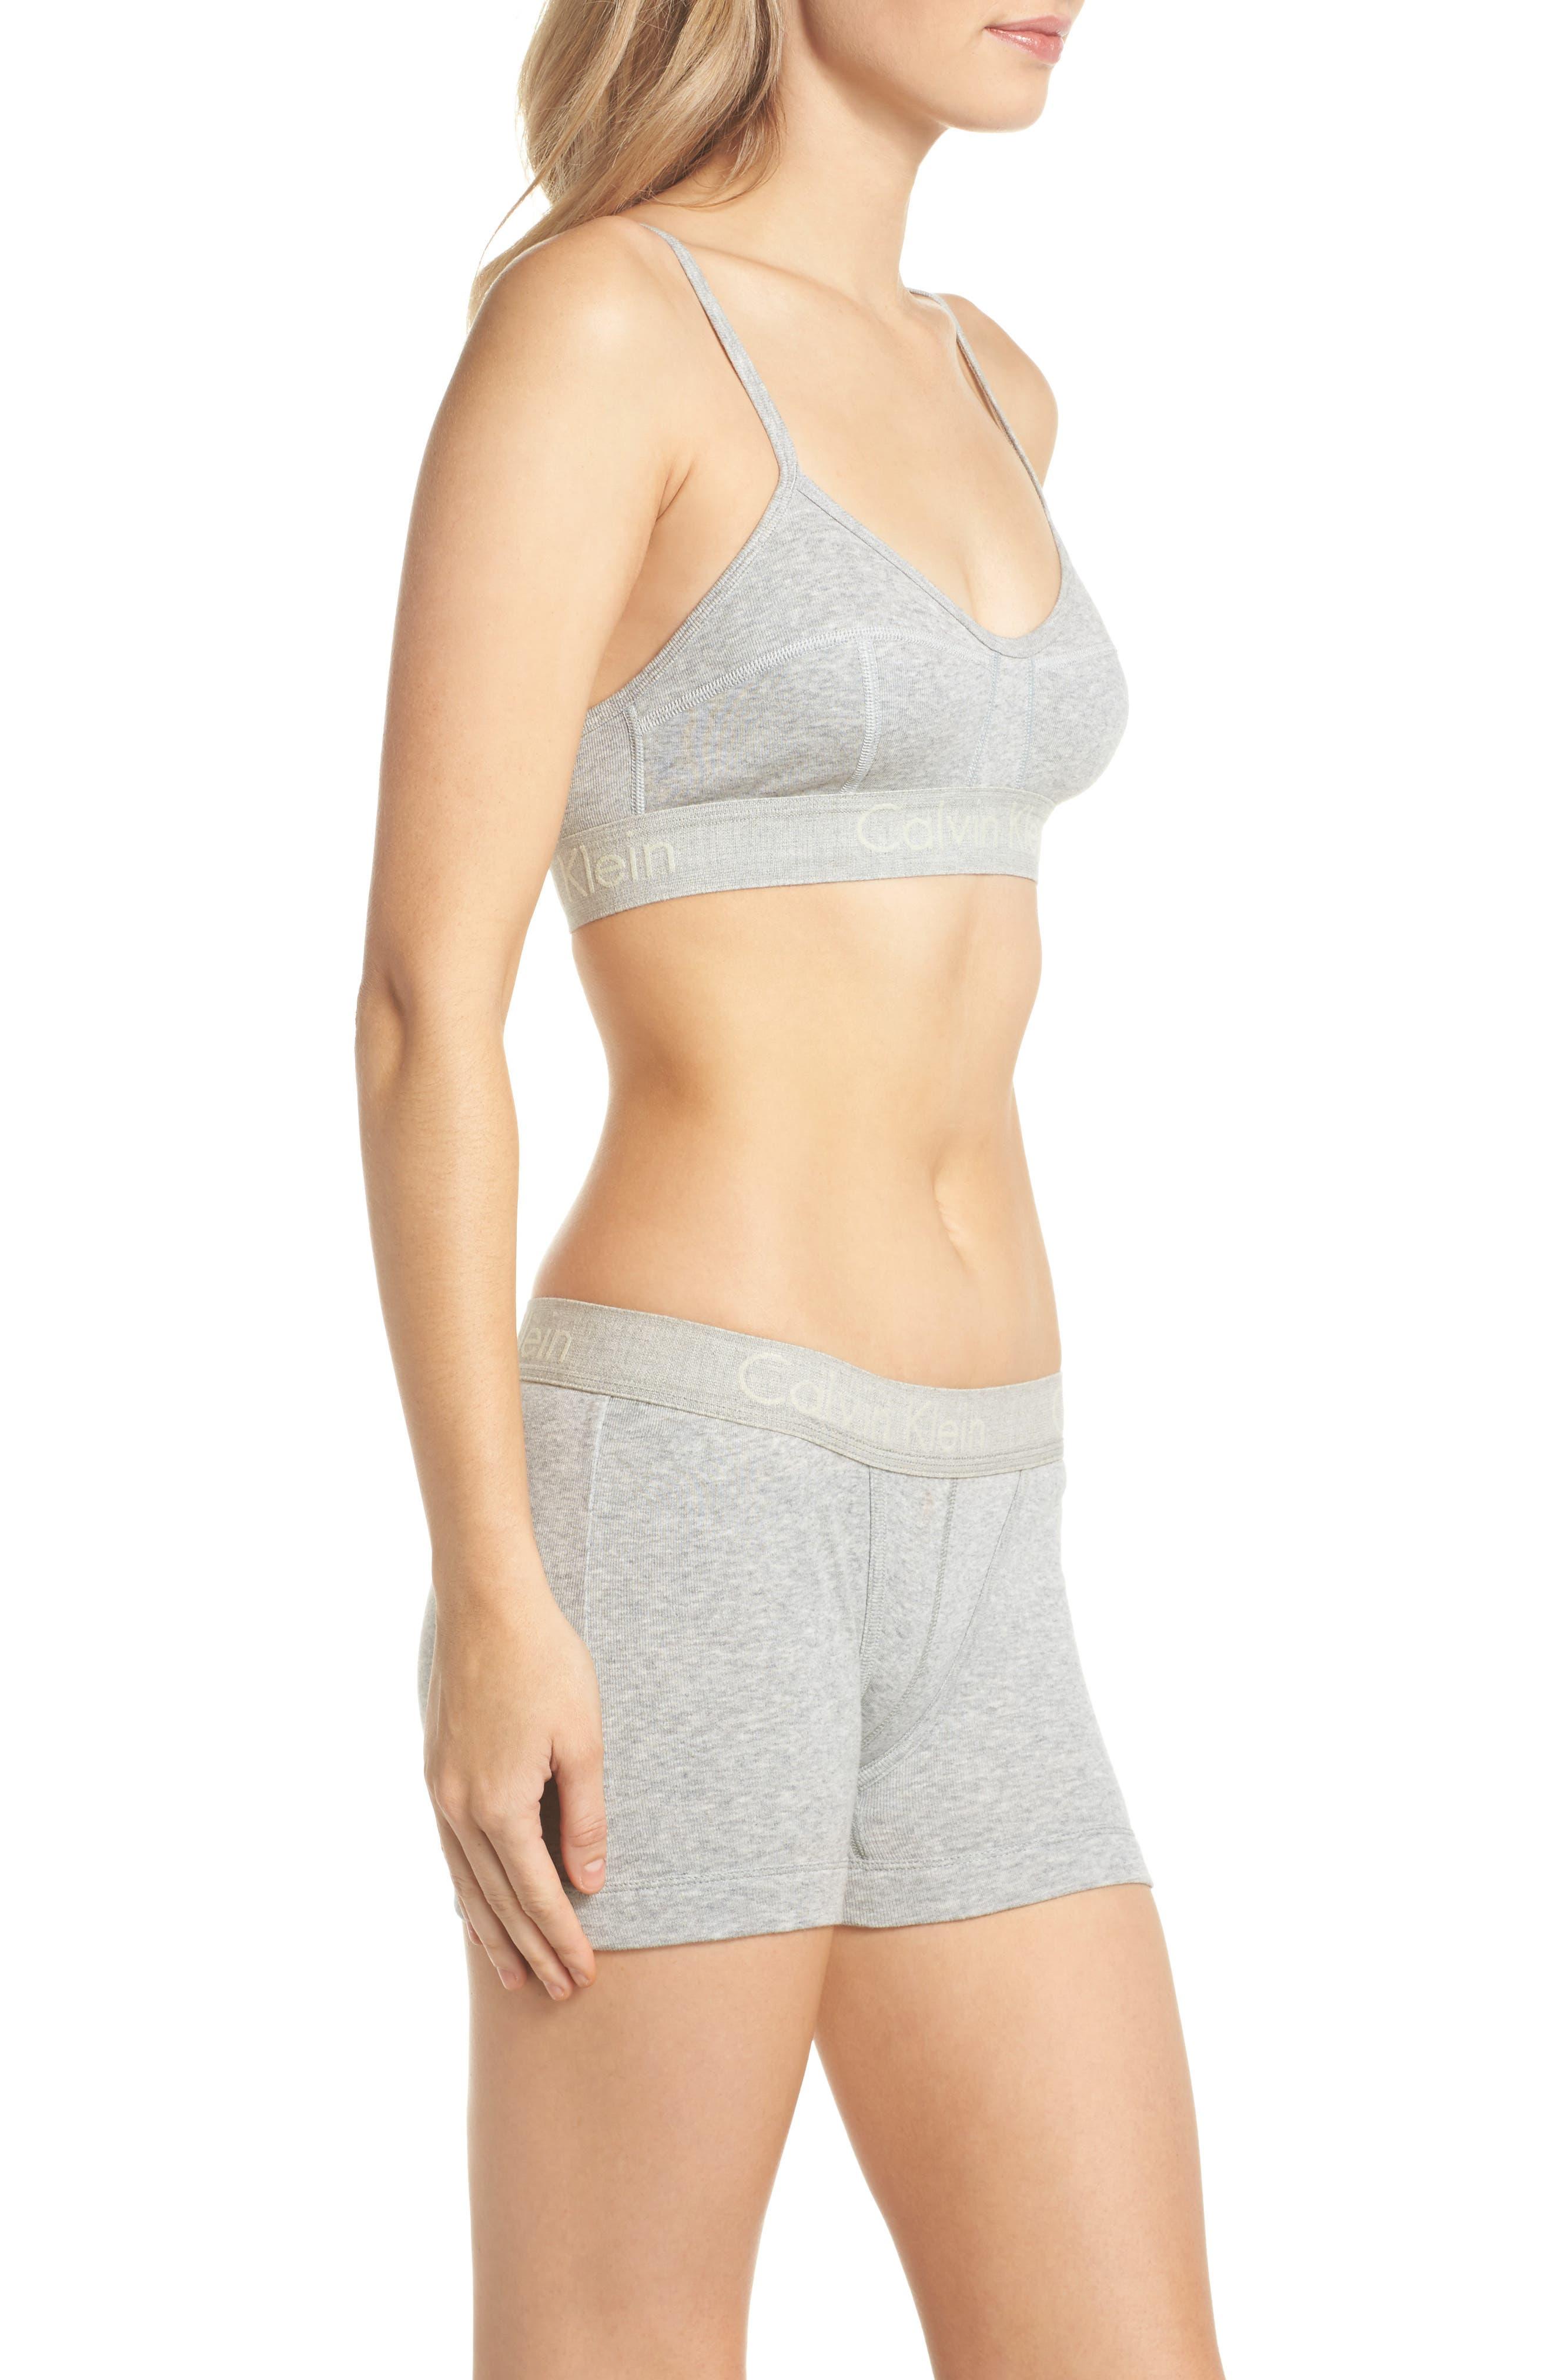 Body Convertible Cotton Bralette,                             Alternate thumbnail 9, color,                             Grey Heather